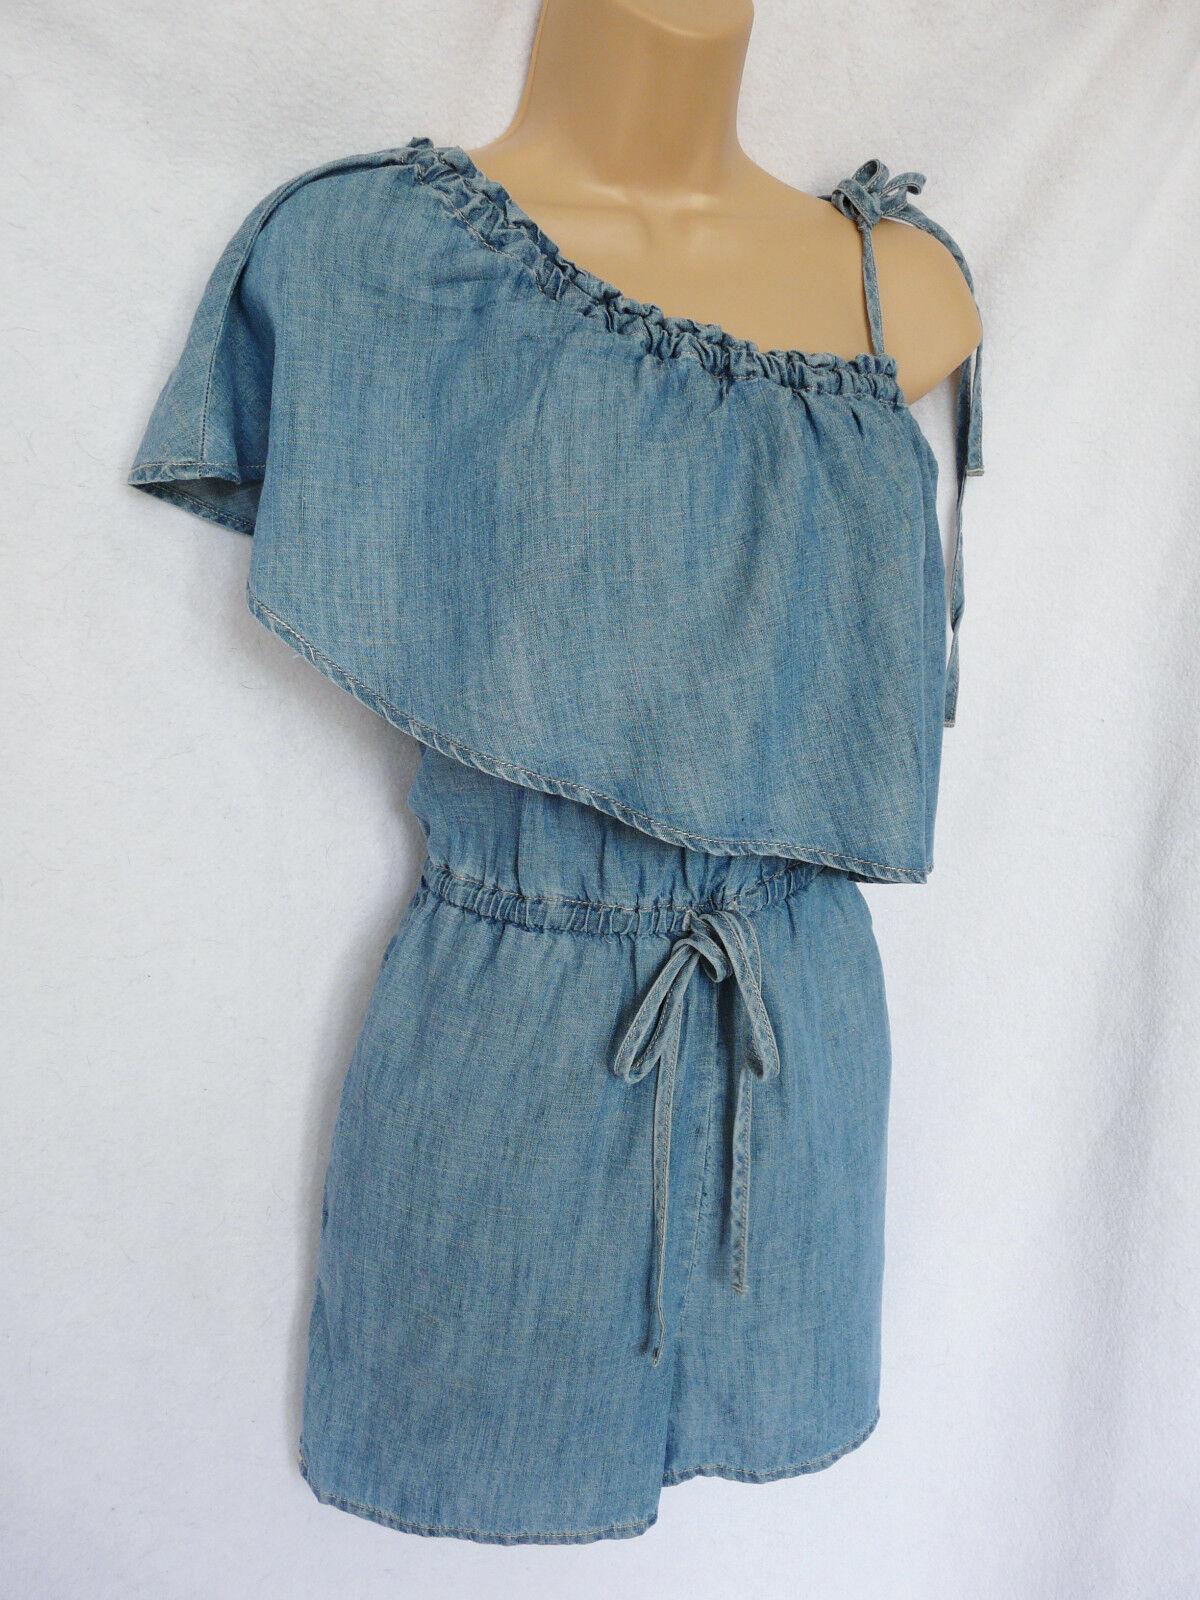 BNWT NEXT soft denim look summer bluee elasticated waist one shoulder playsuit